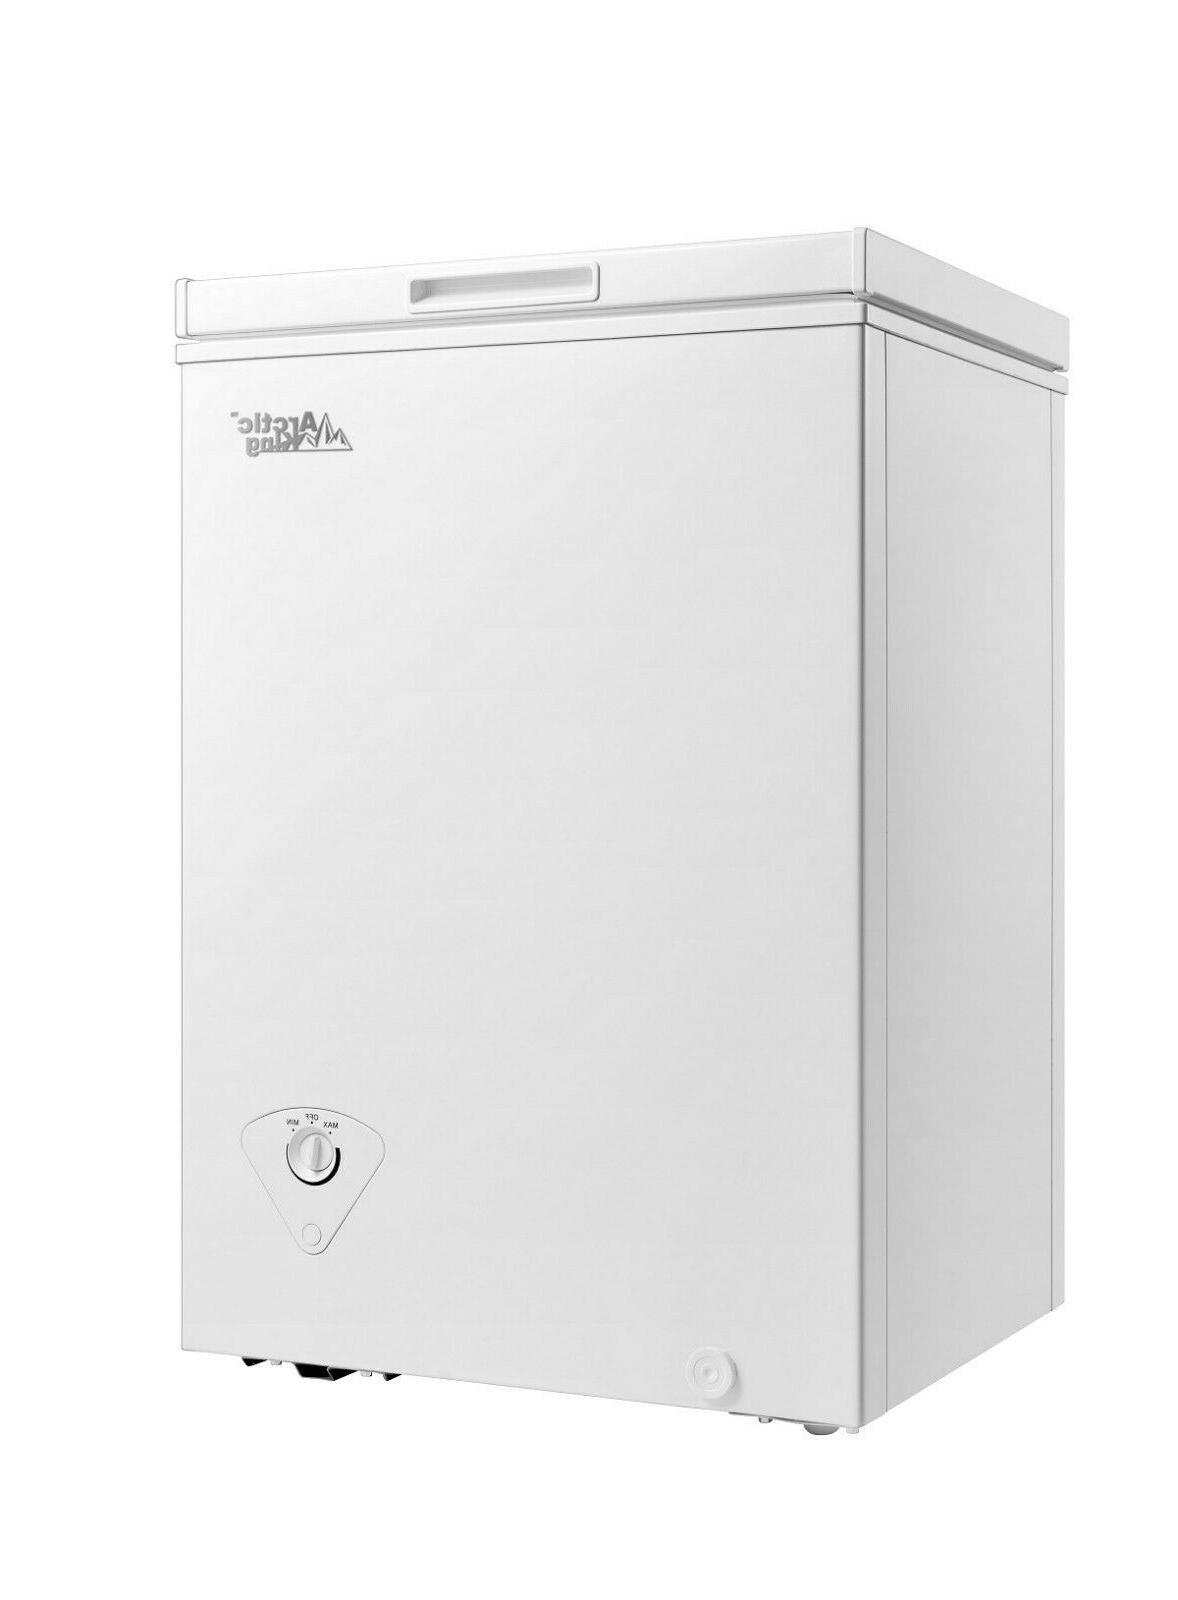 Arctic King Chest Freezer, 3.5 cu ft -   22.20 x 20.60 x 33.